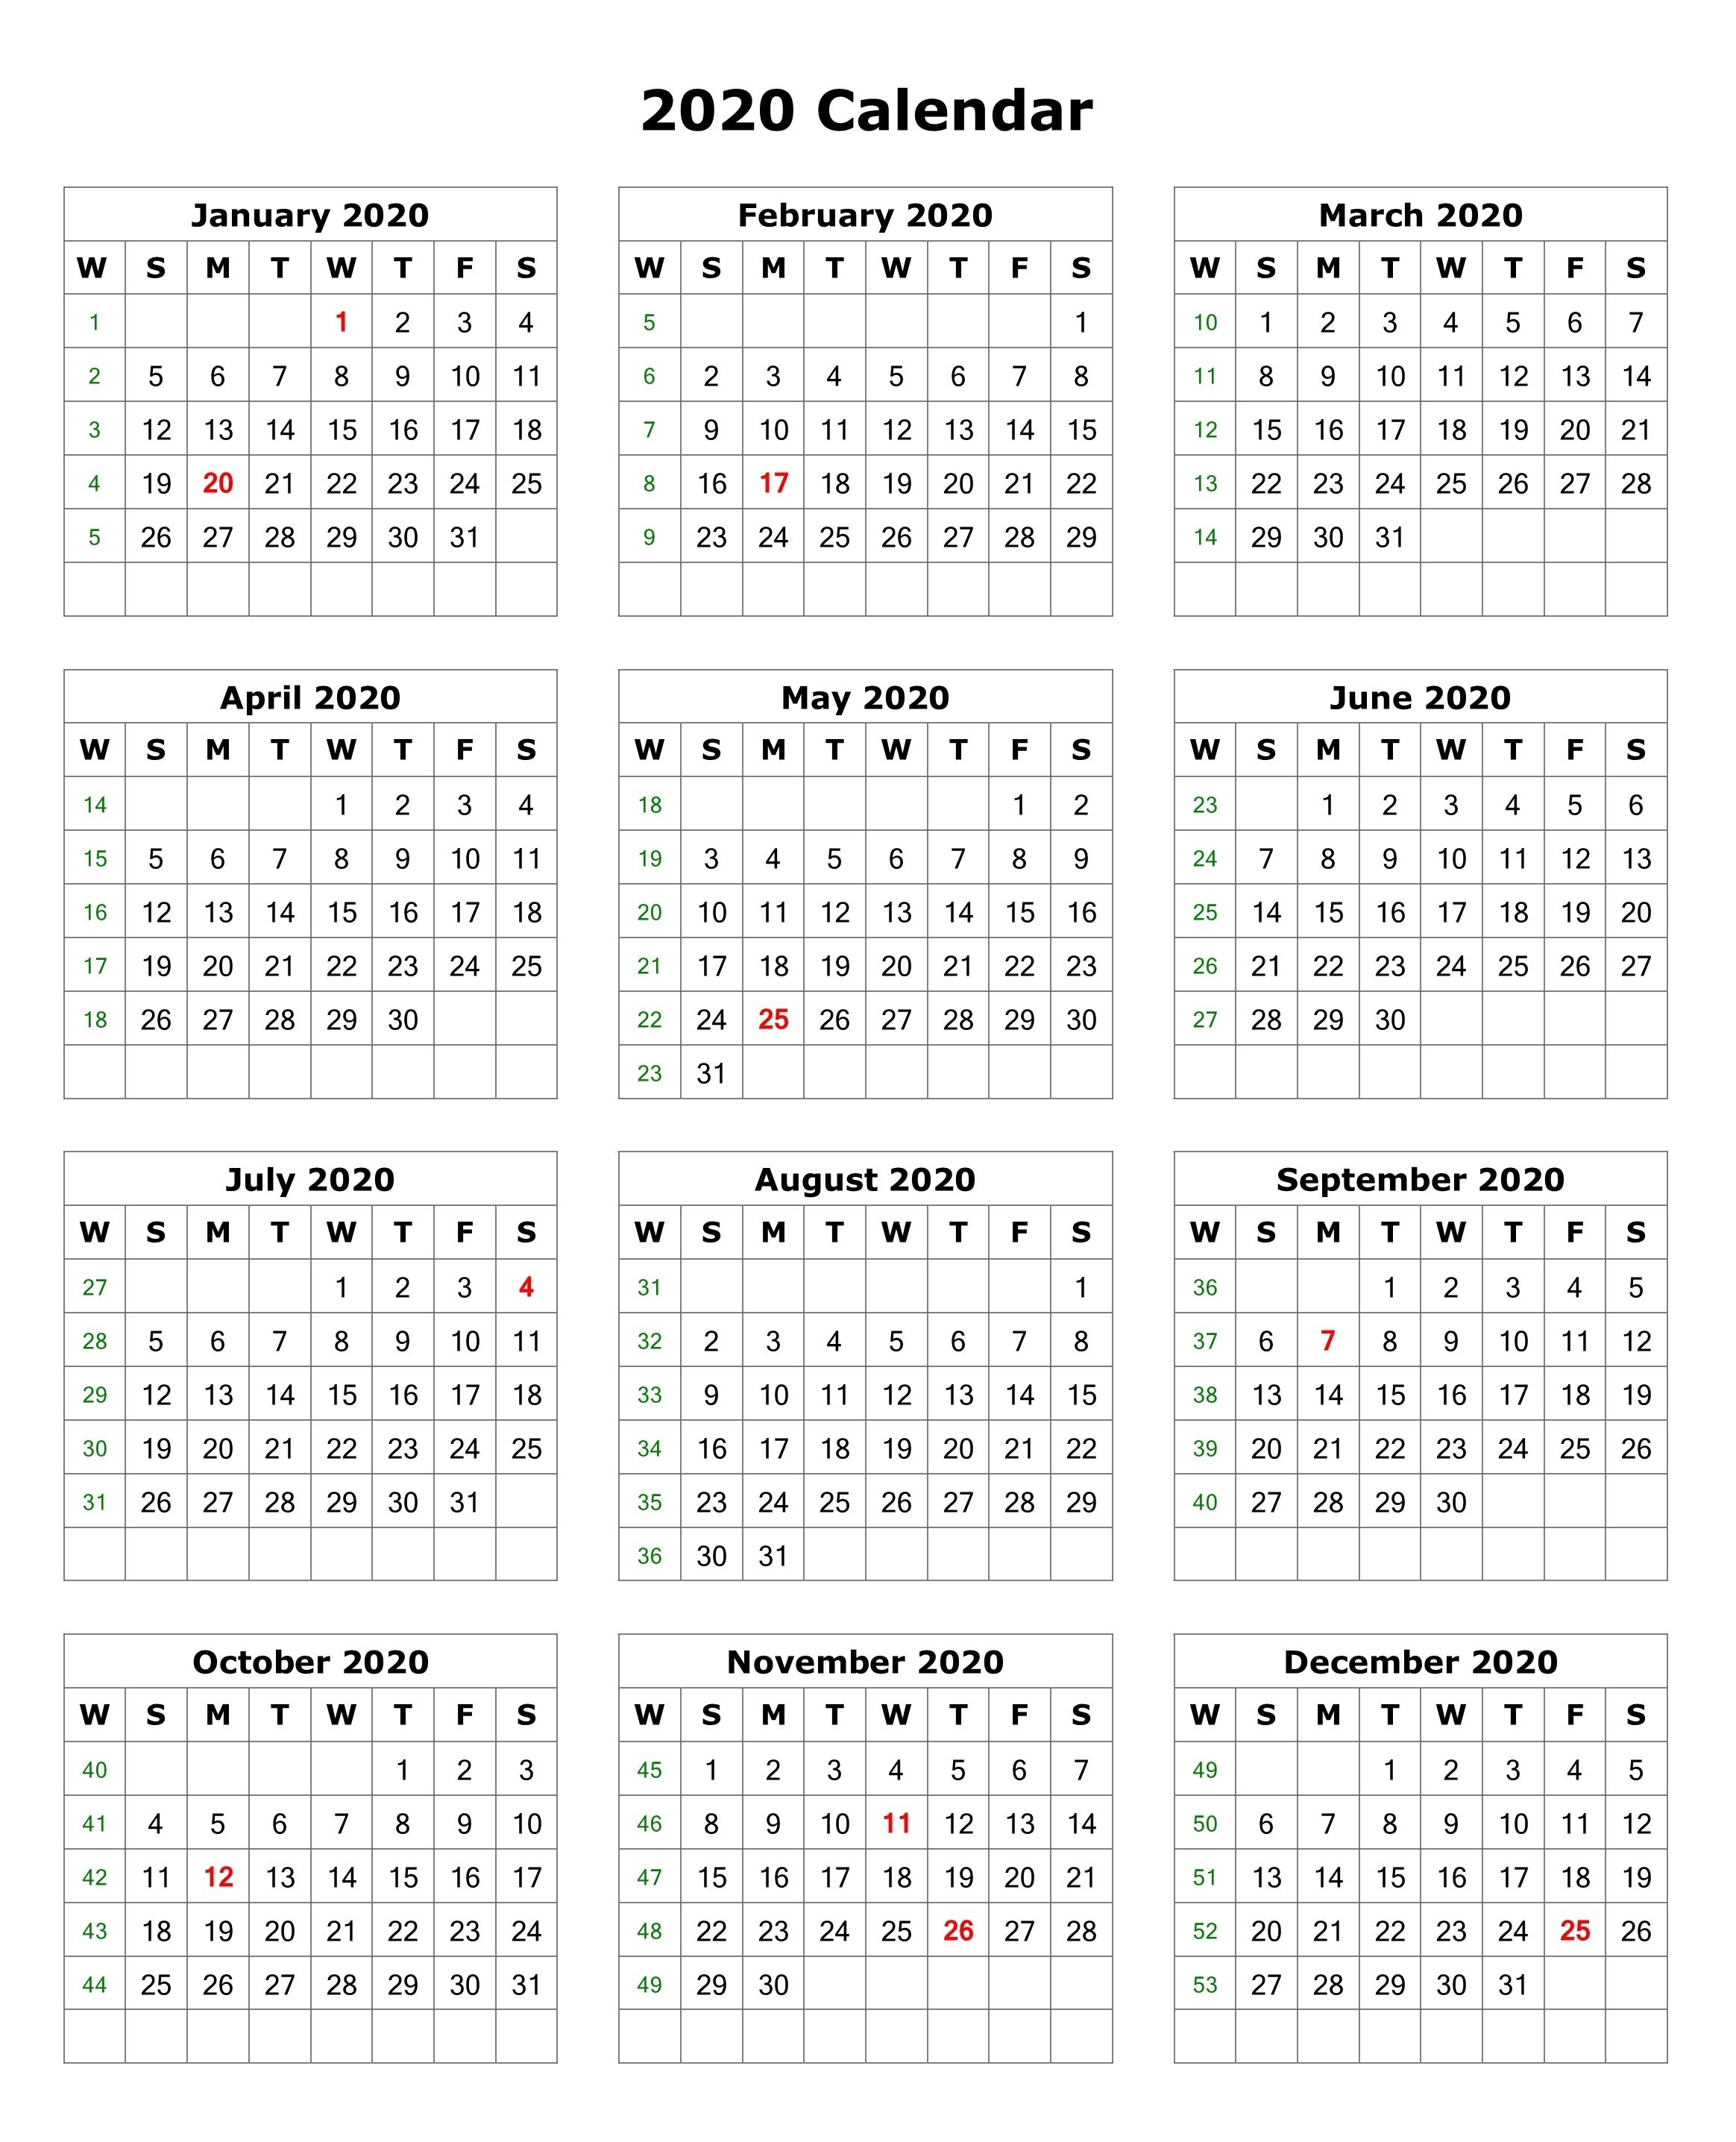 Calendar for 2020 Printable 2020 E Page Calendar Printable